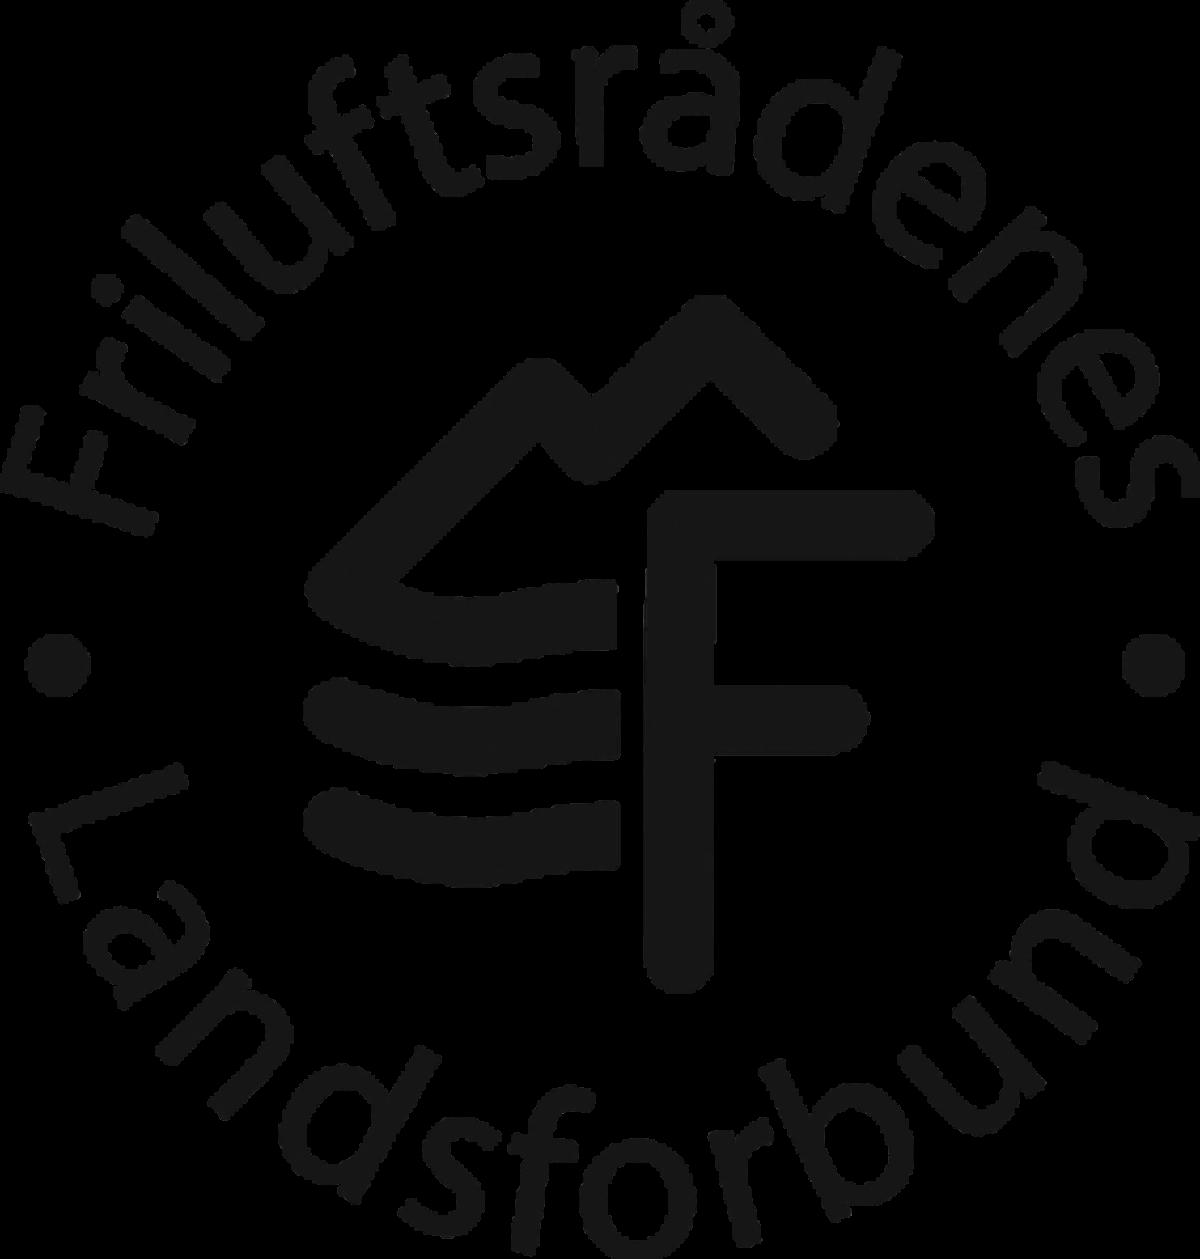 Friluftsradenes-LF_rund_black.png